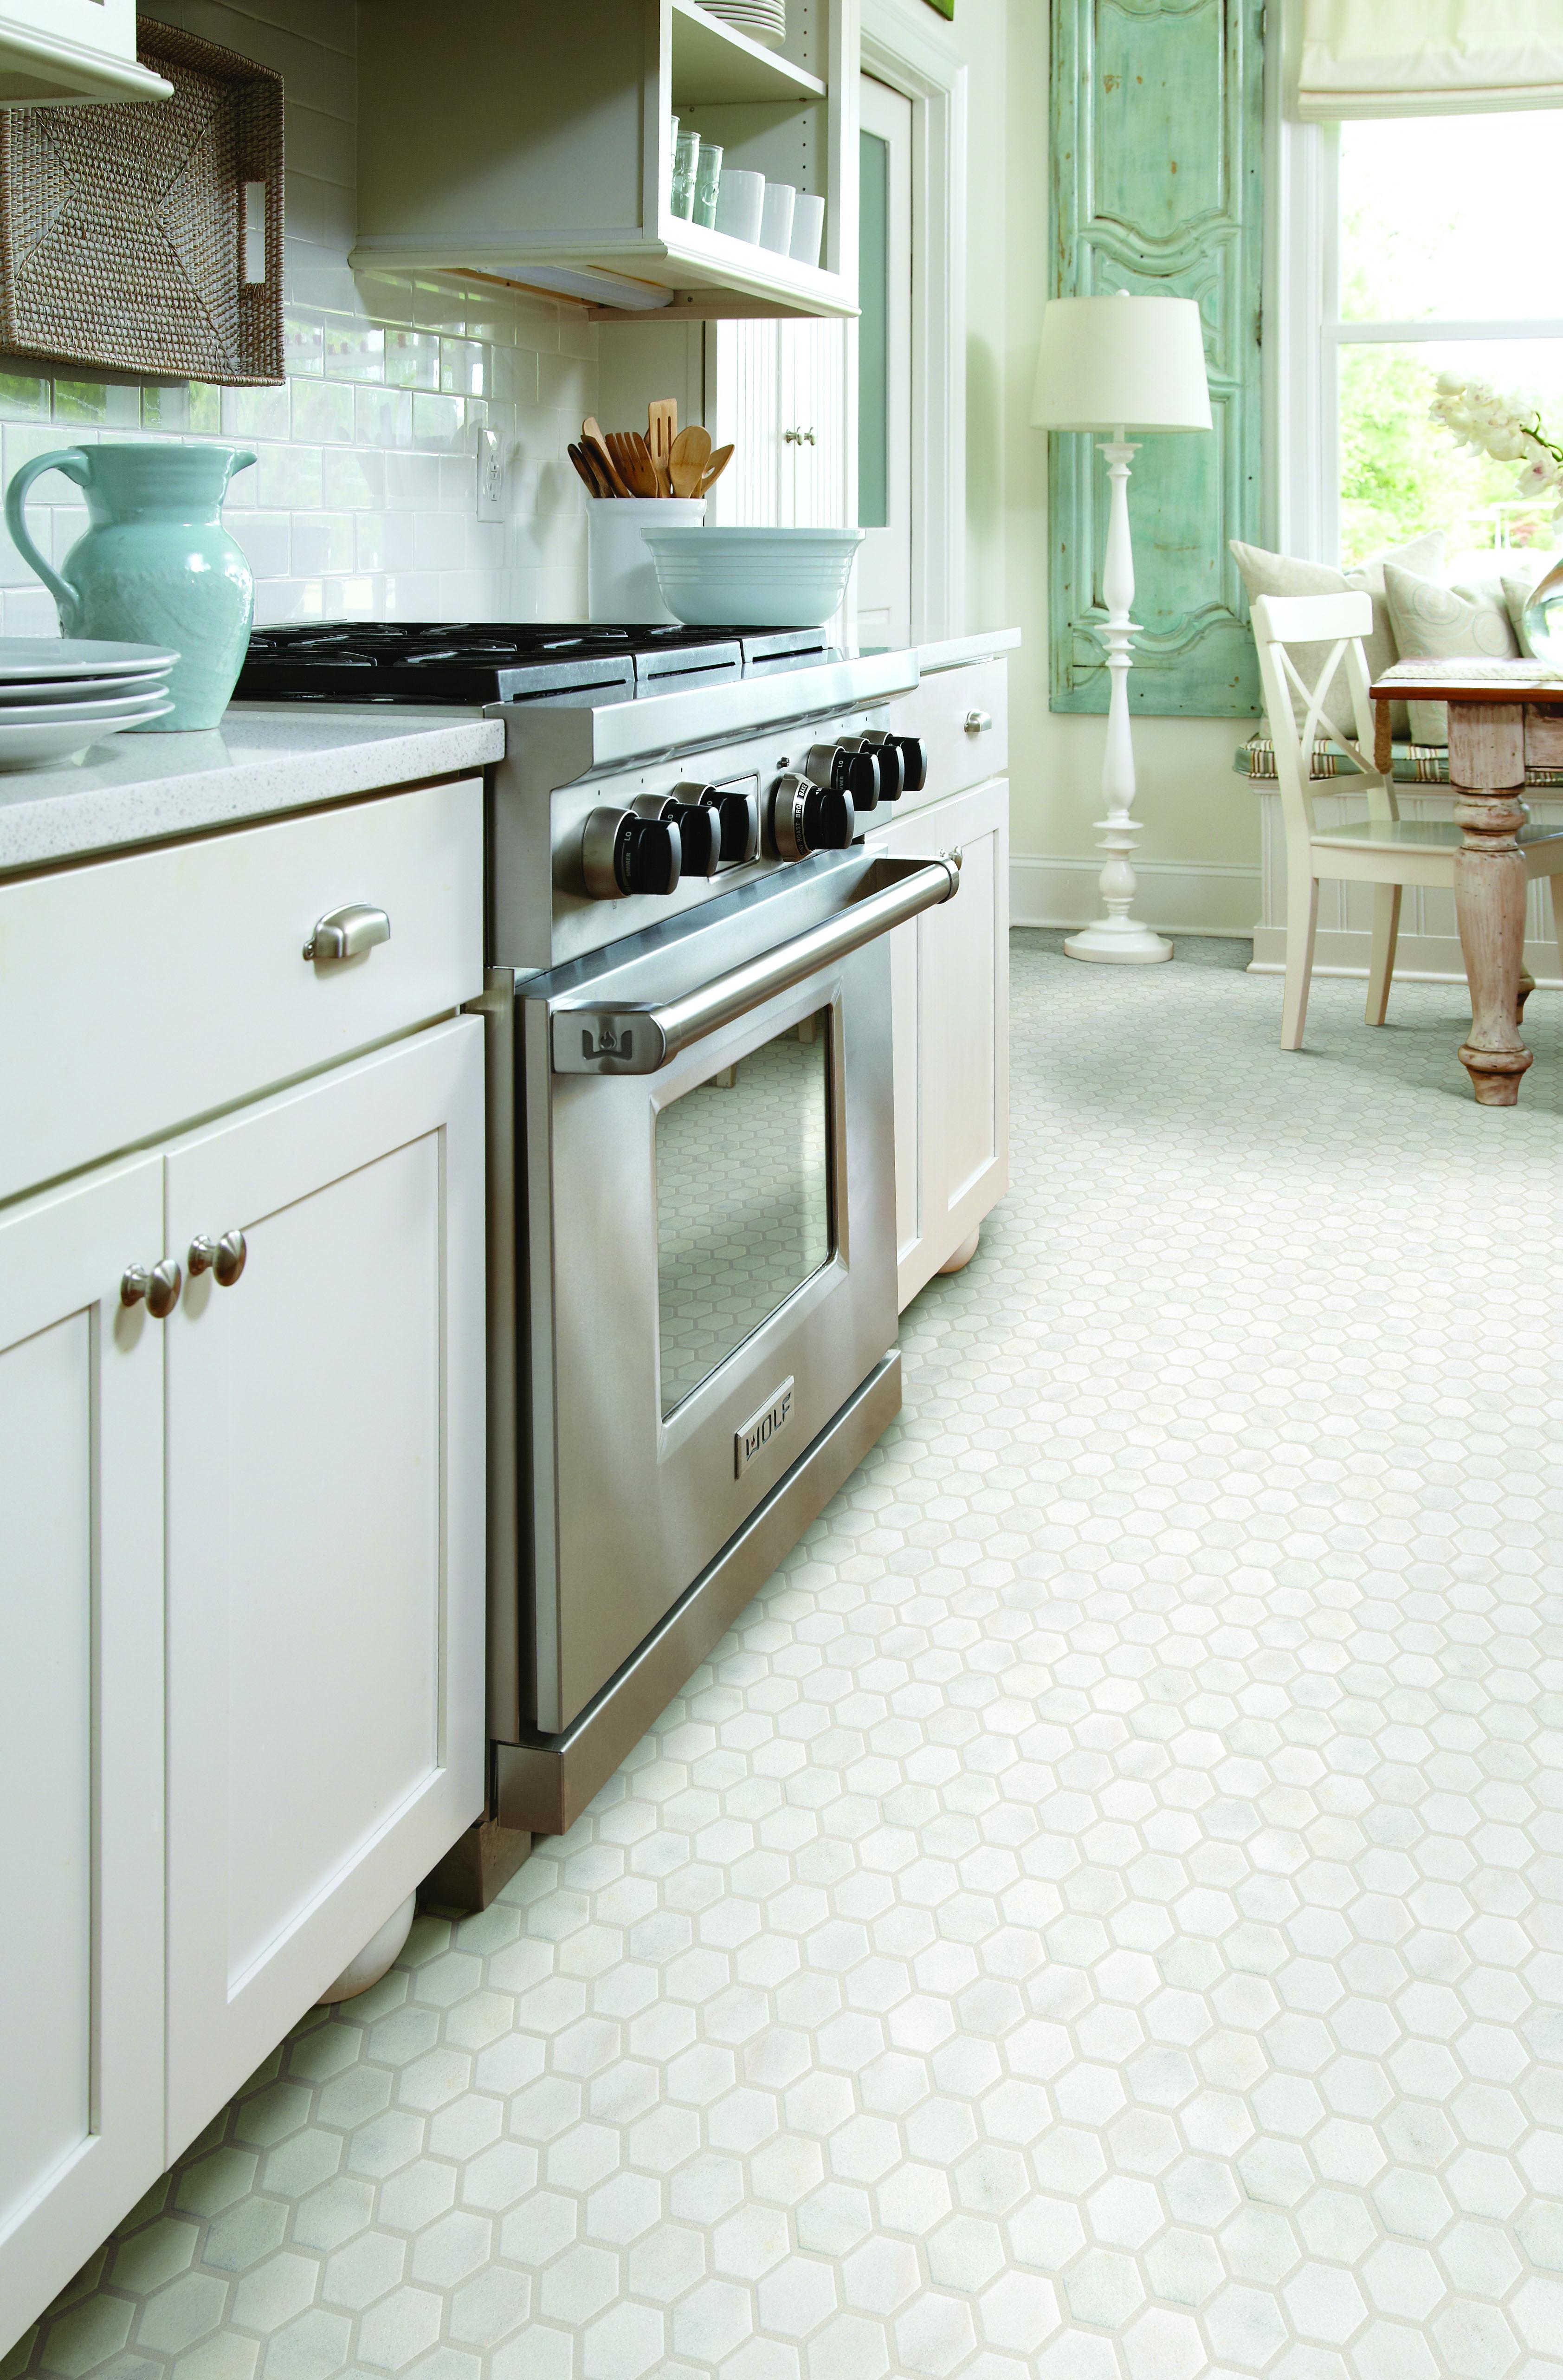 Tile Showrooms In Mokena Il Highland In Creative Carpet Flooring Flooring Sale Carpet Flooring Flooring